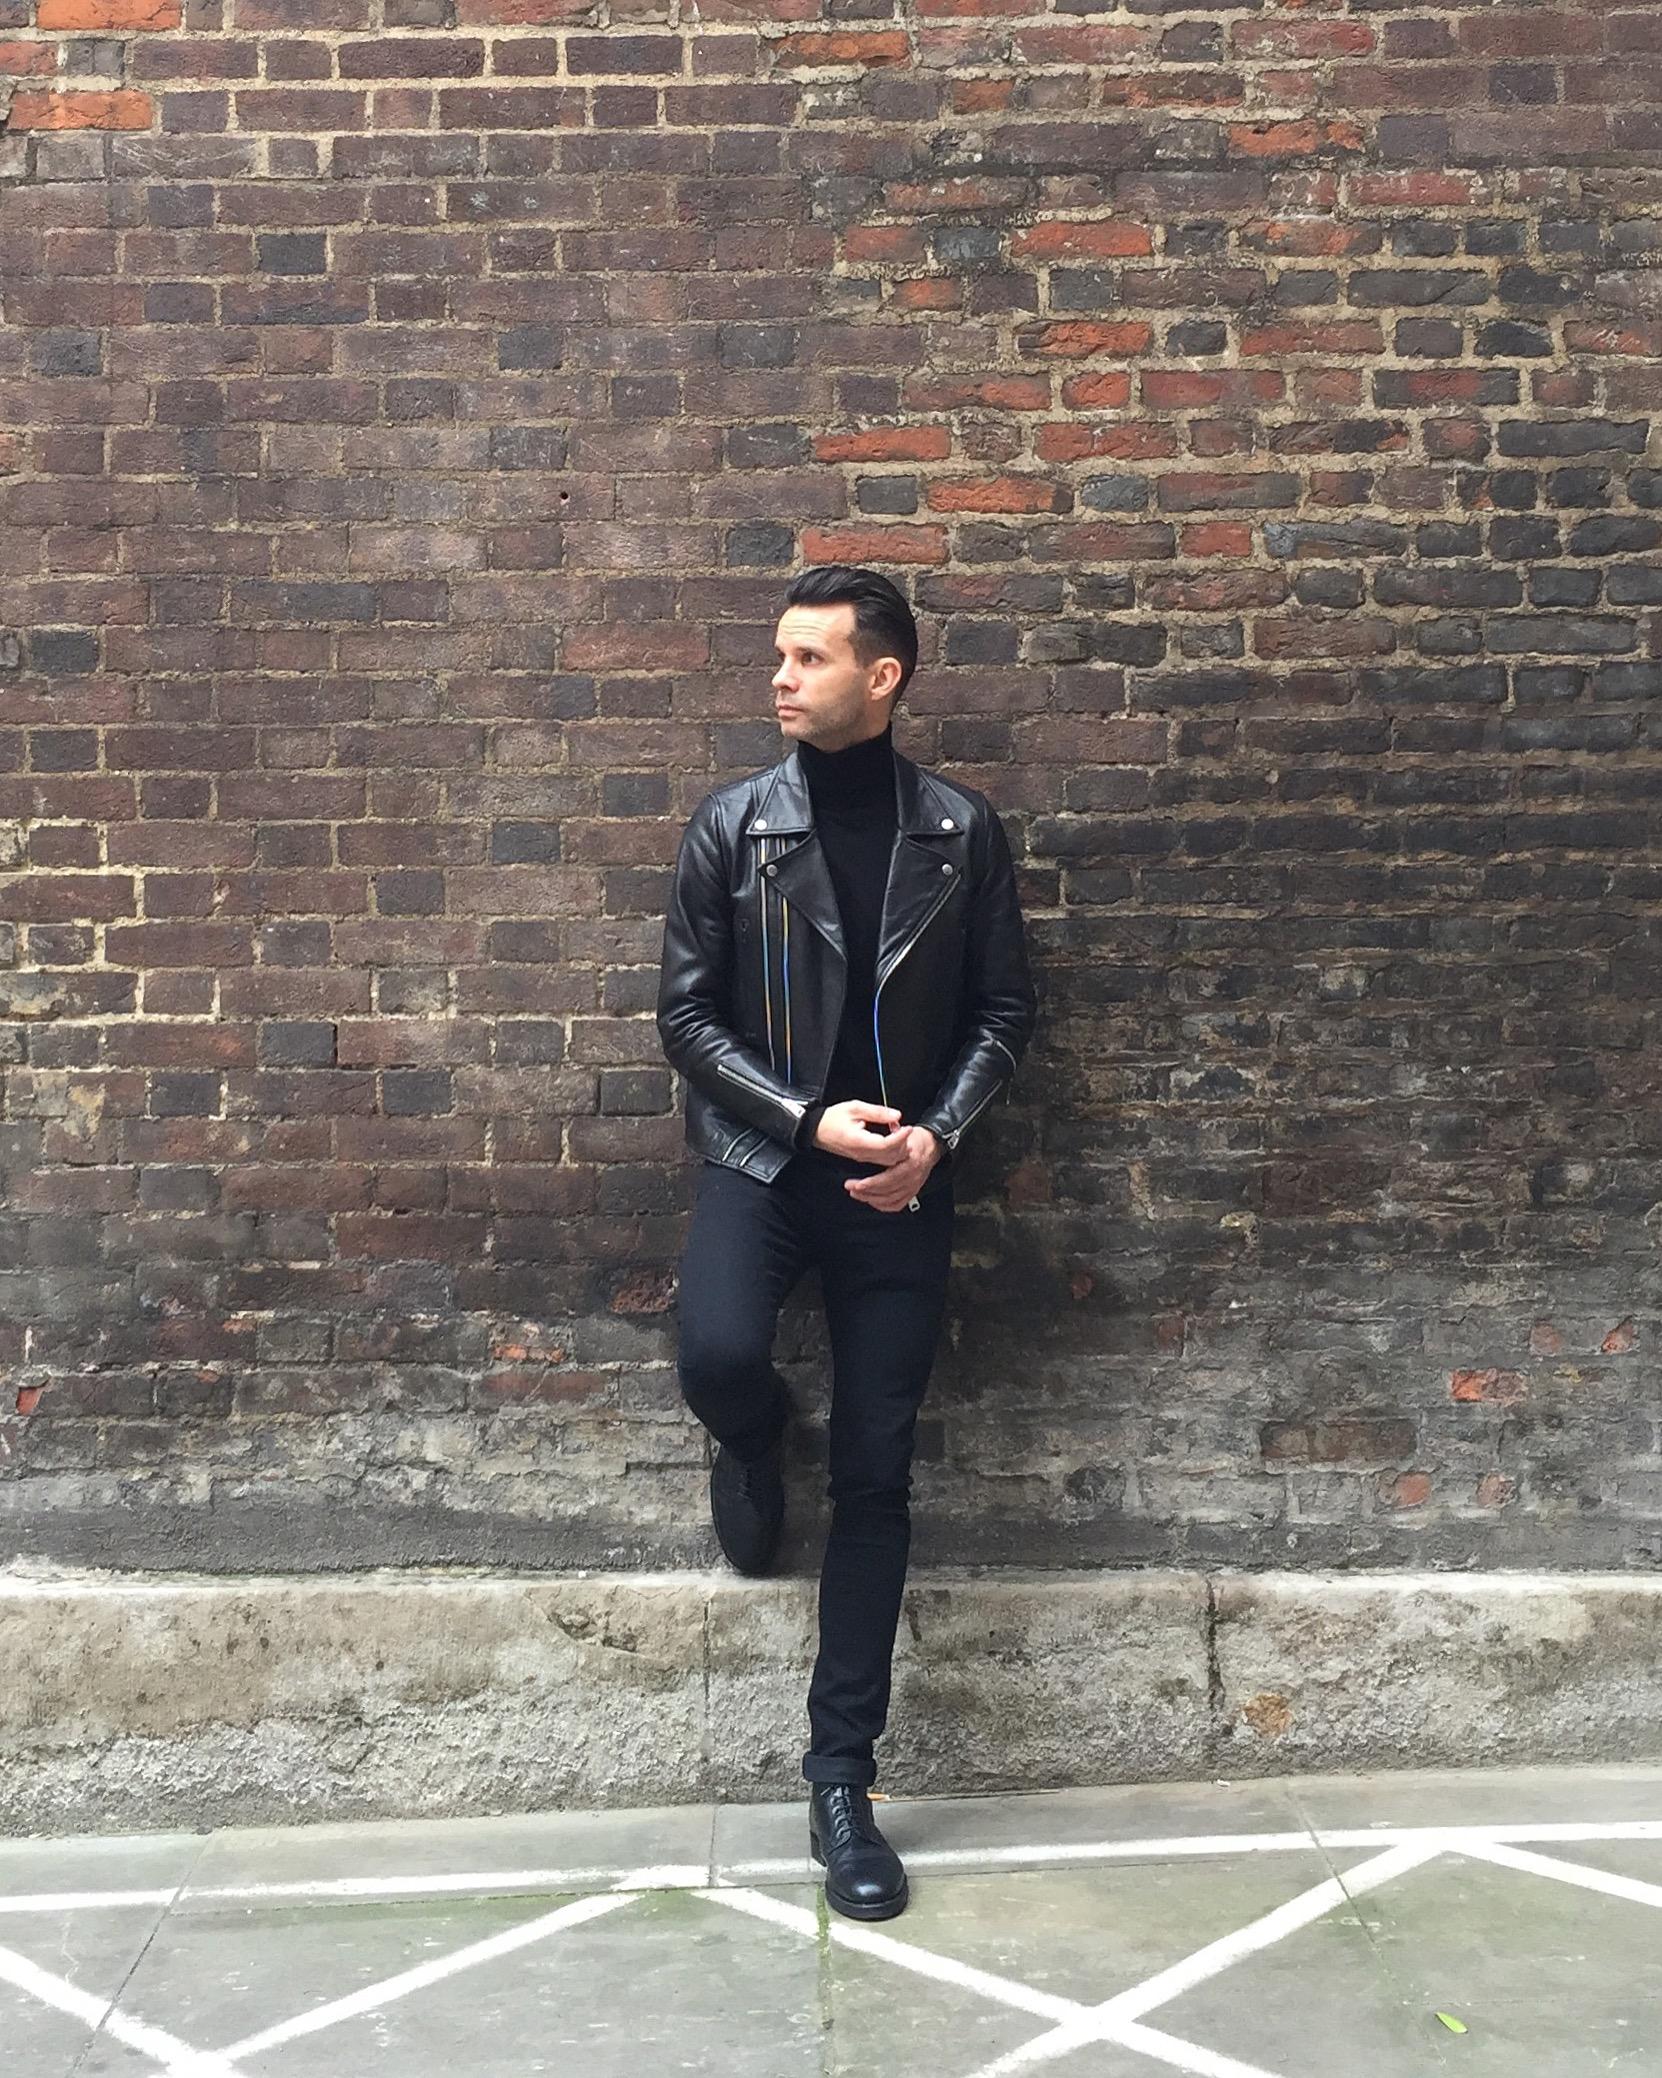 Cs Bartosz Gajec Izzue Leather Biker Jacket.JPG